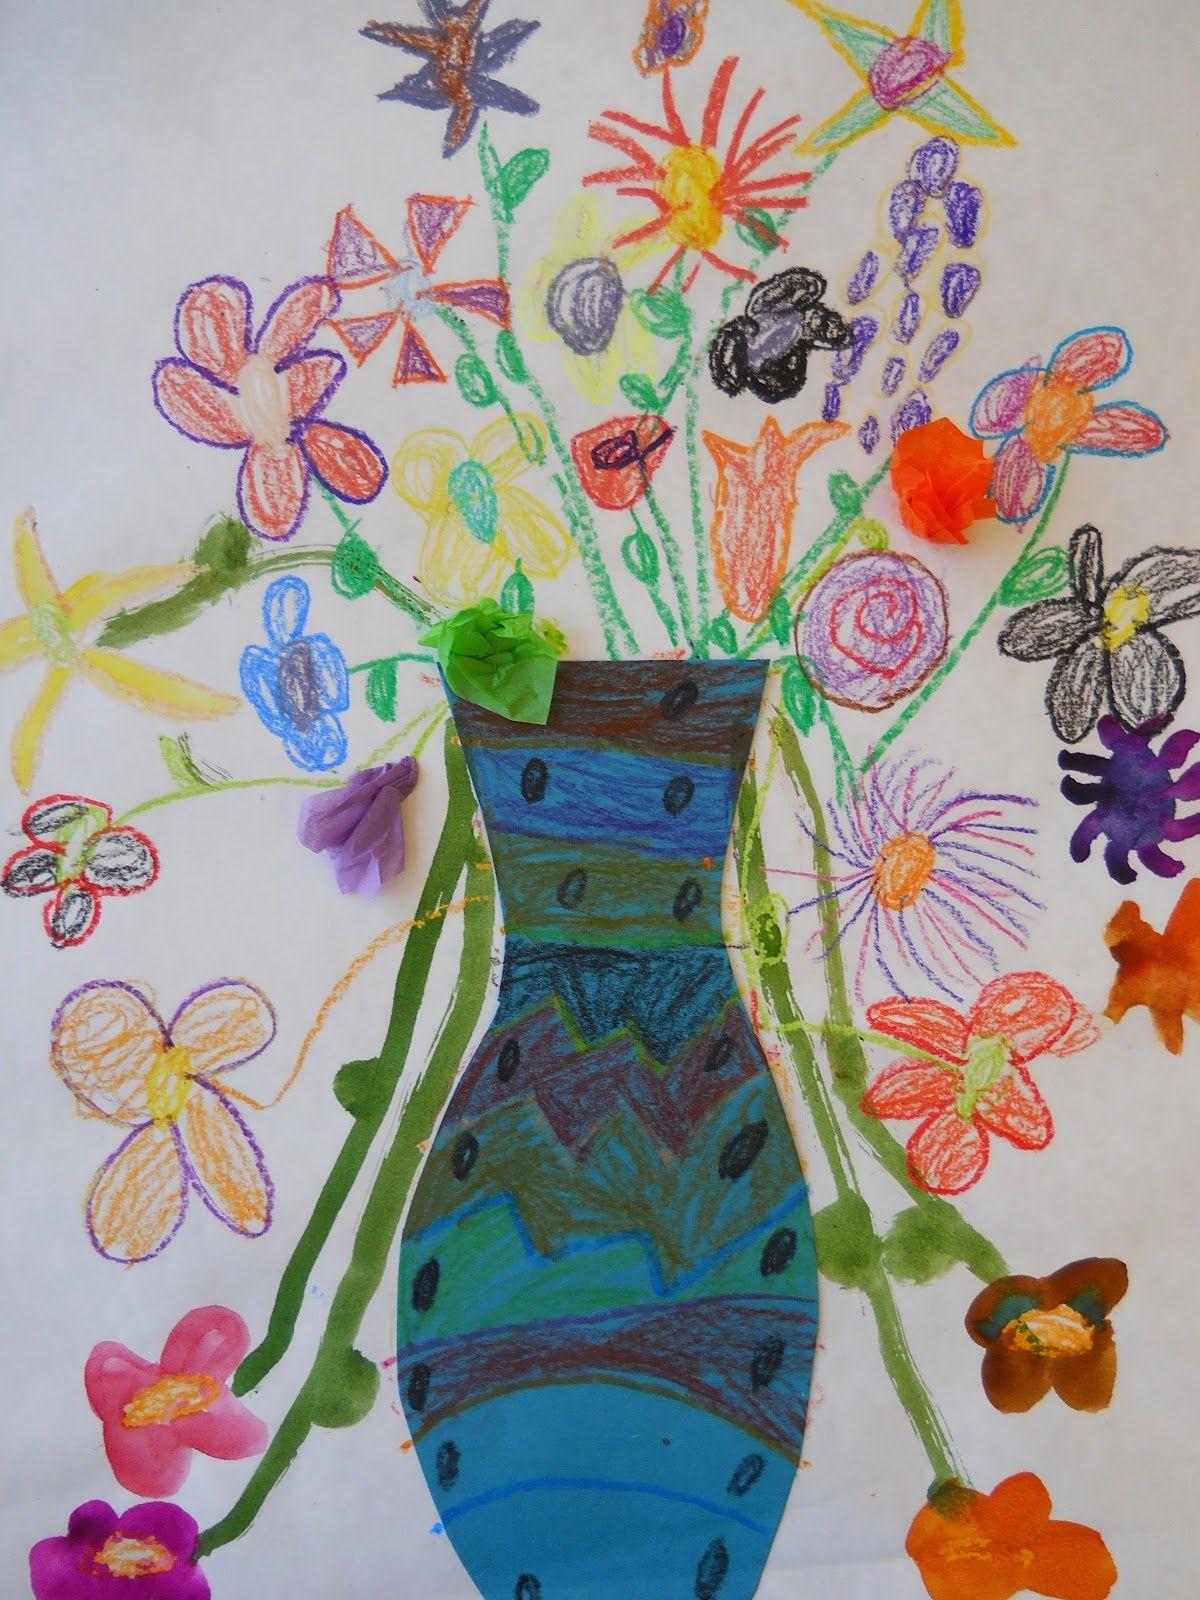 The Elementary Art Room!: Kindergarten spray paint over flowers with